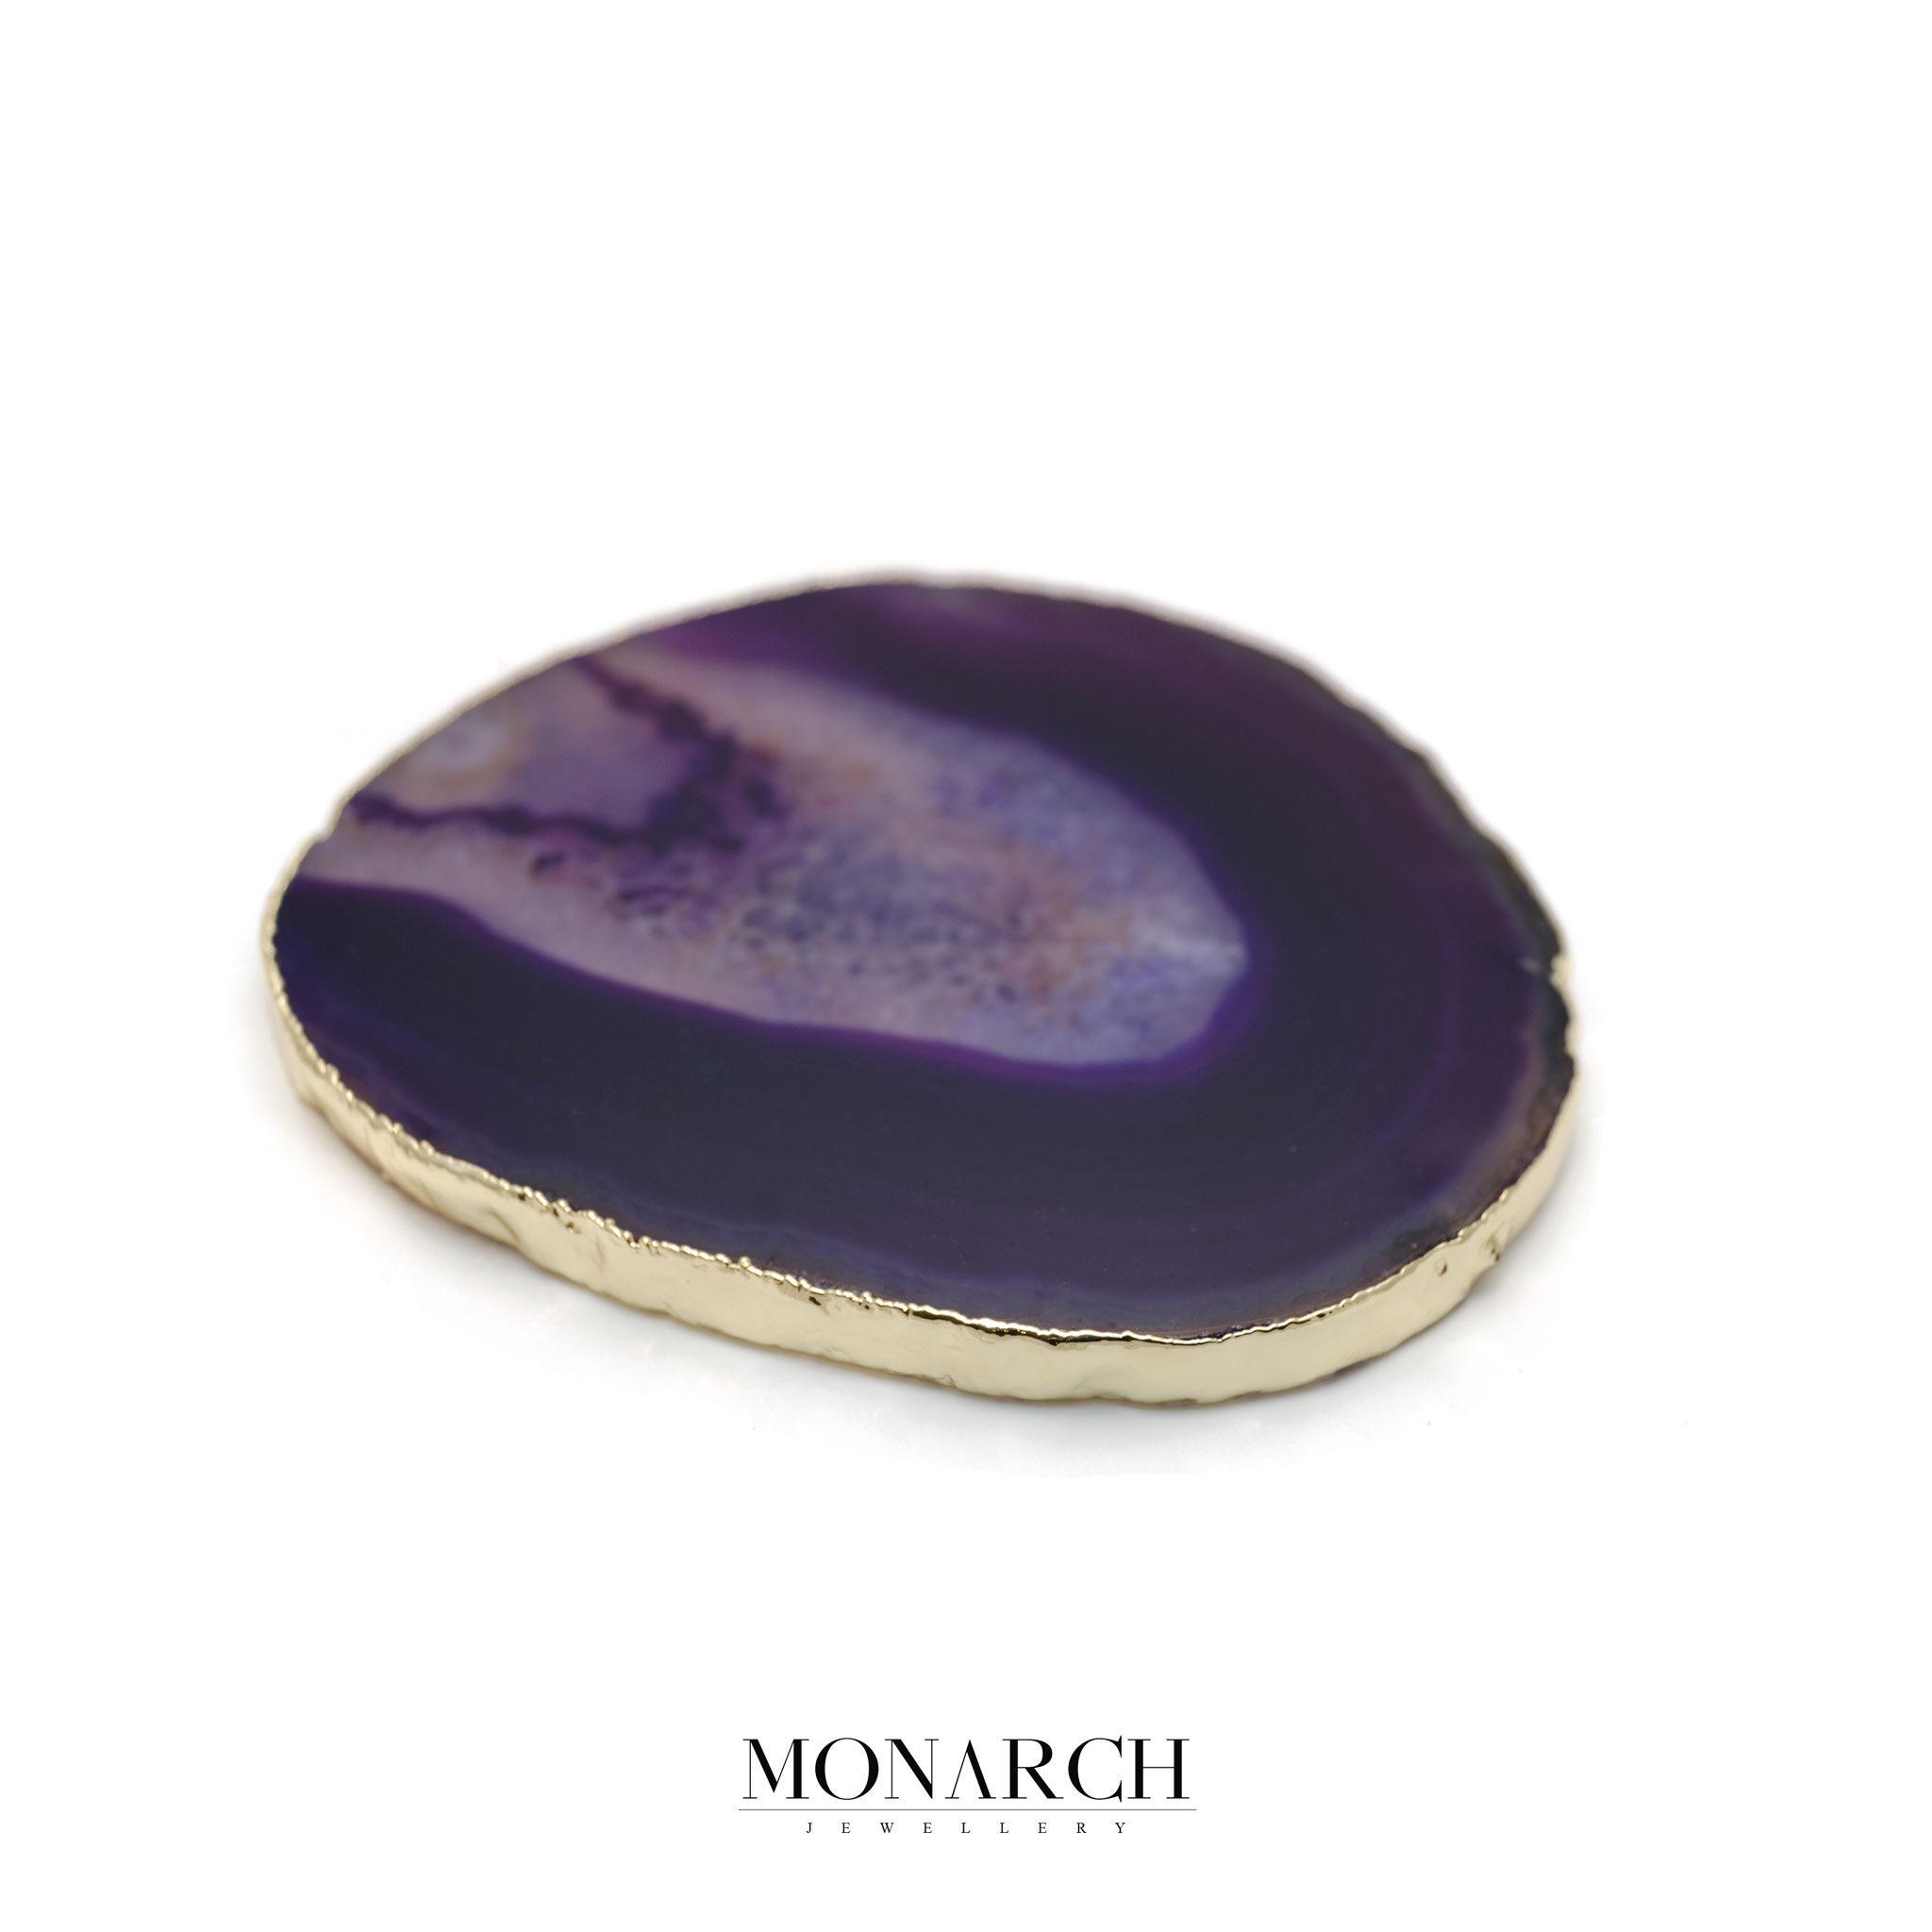 99-Monarch-Jewellery-24k-Gold-Purple-Eye-Stone-Glass-Holder–resized